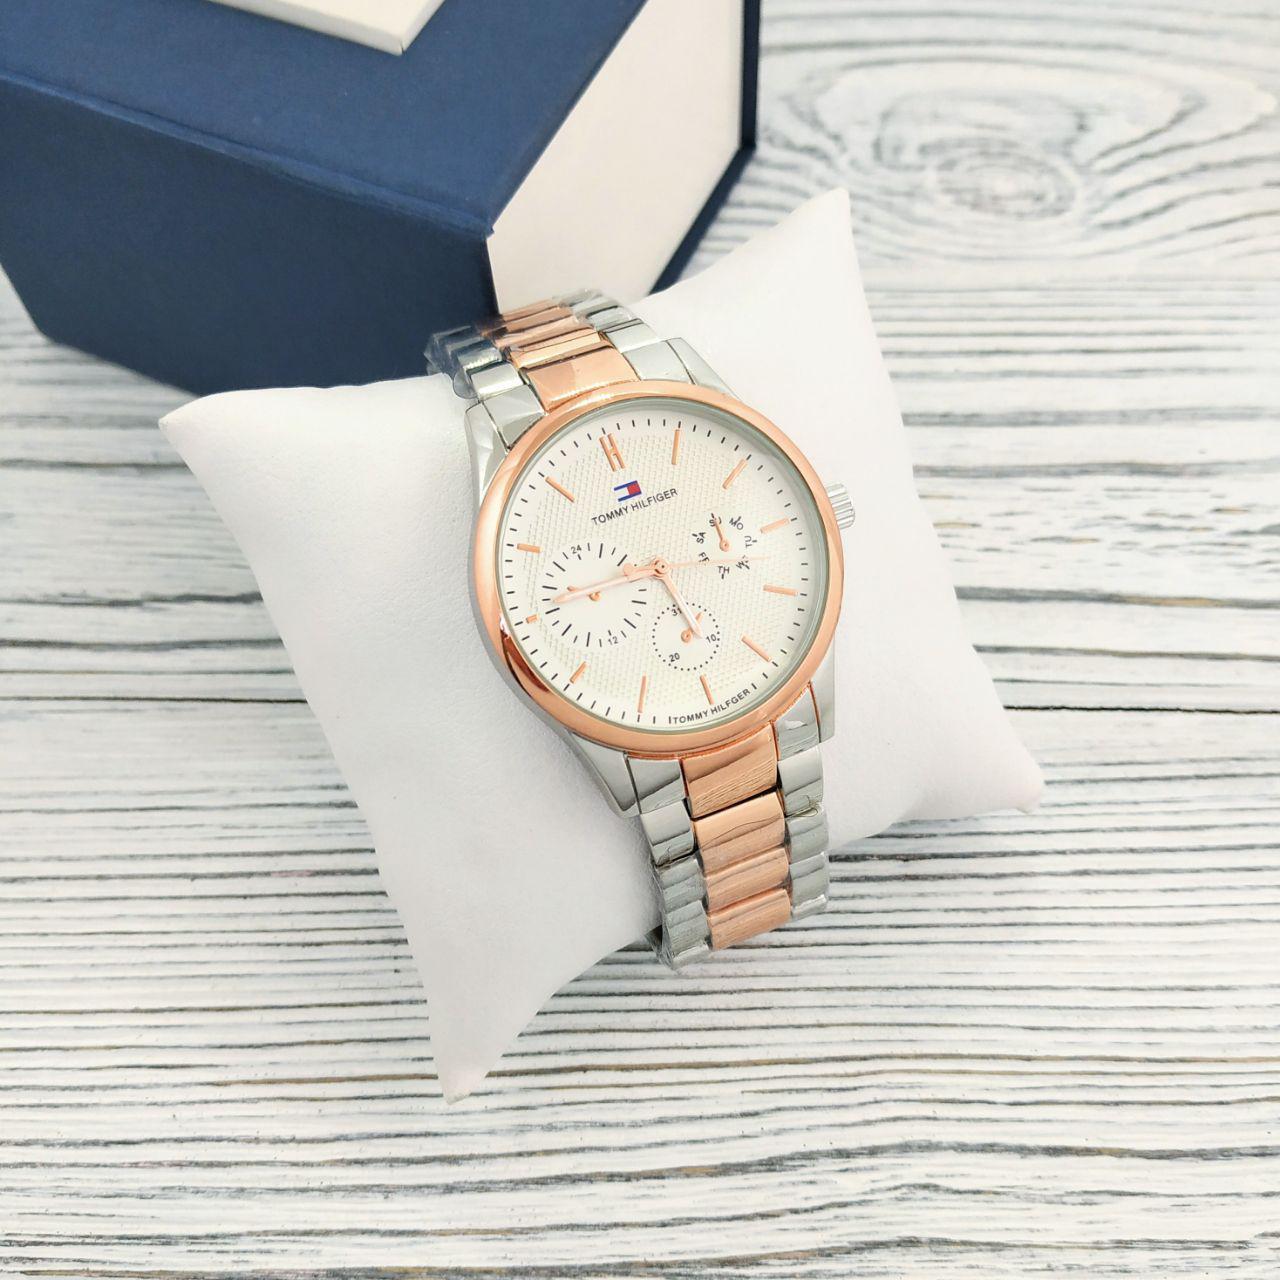 Наручные женские часы Tommy Hilfiger 1074-0144